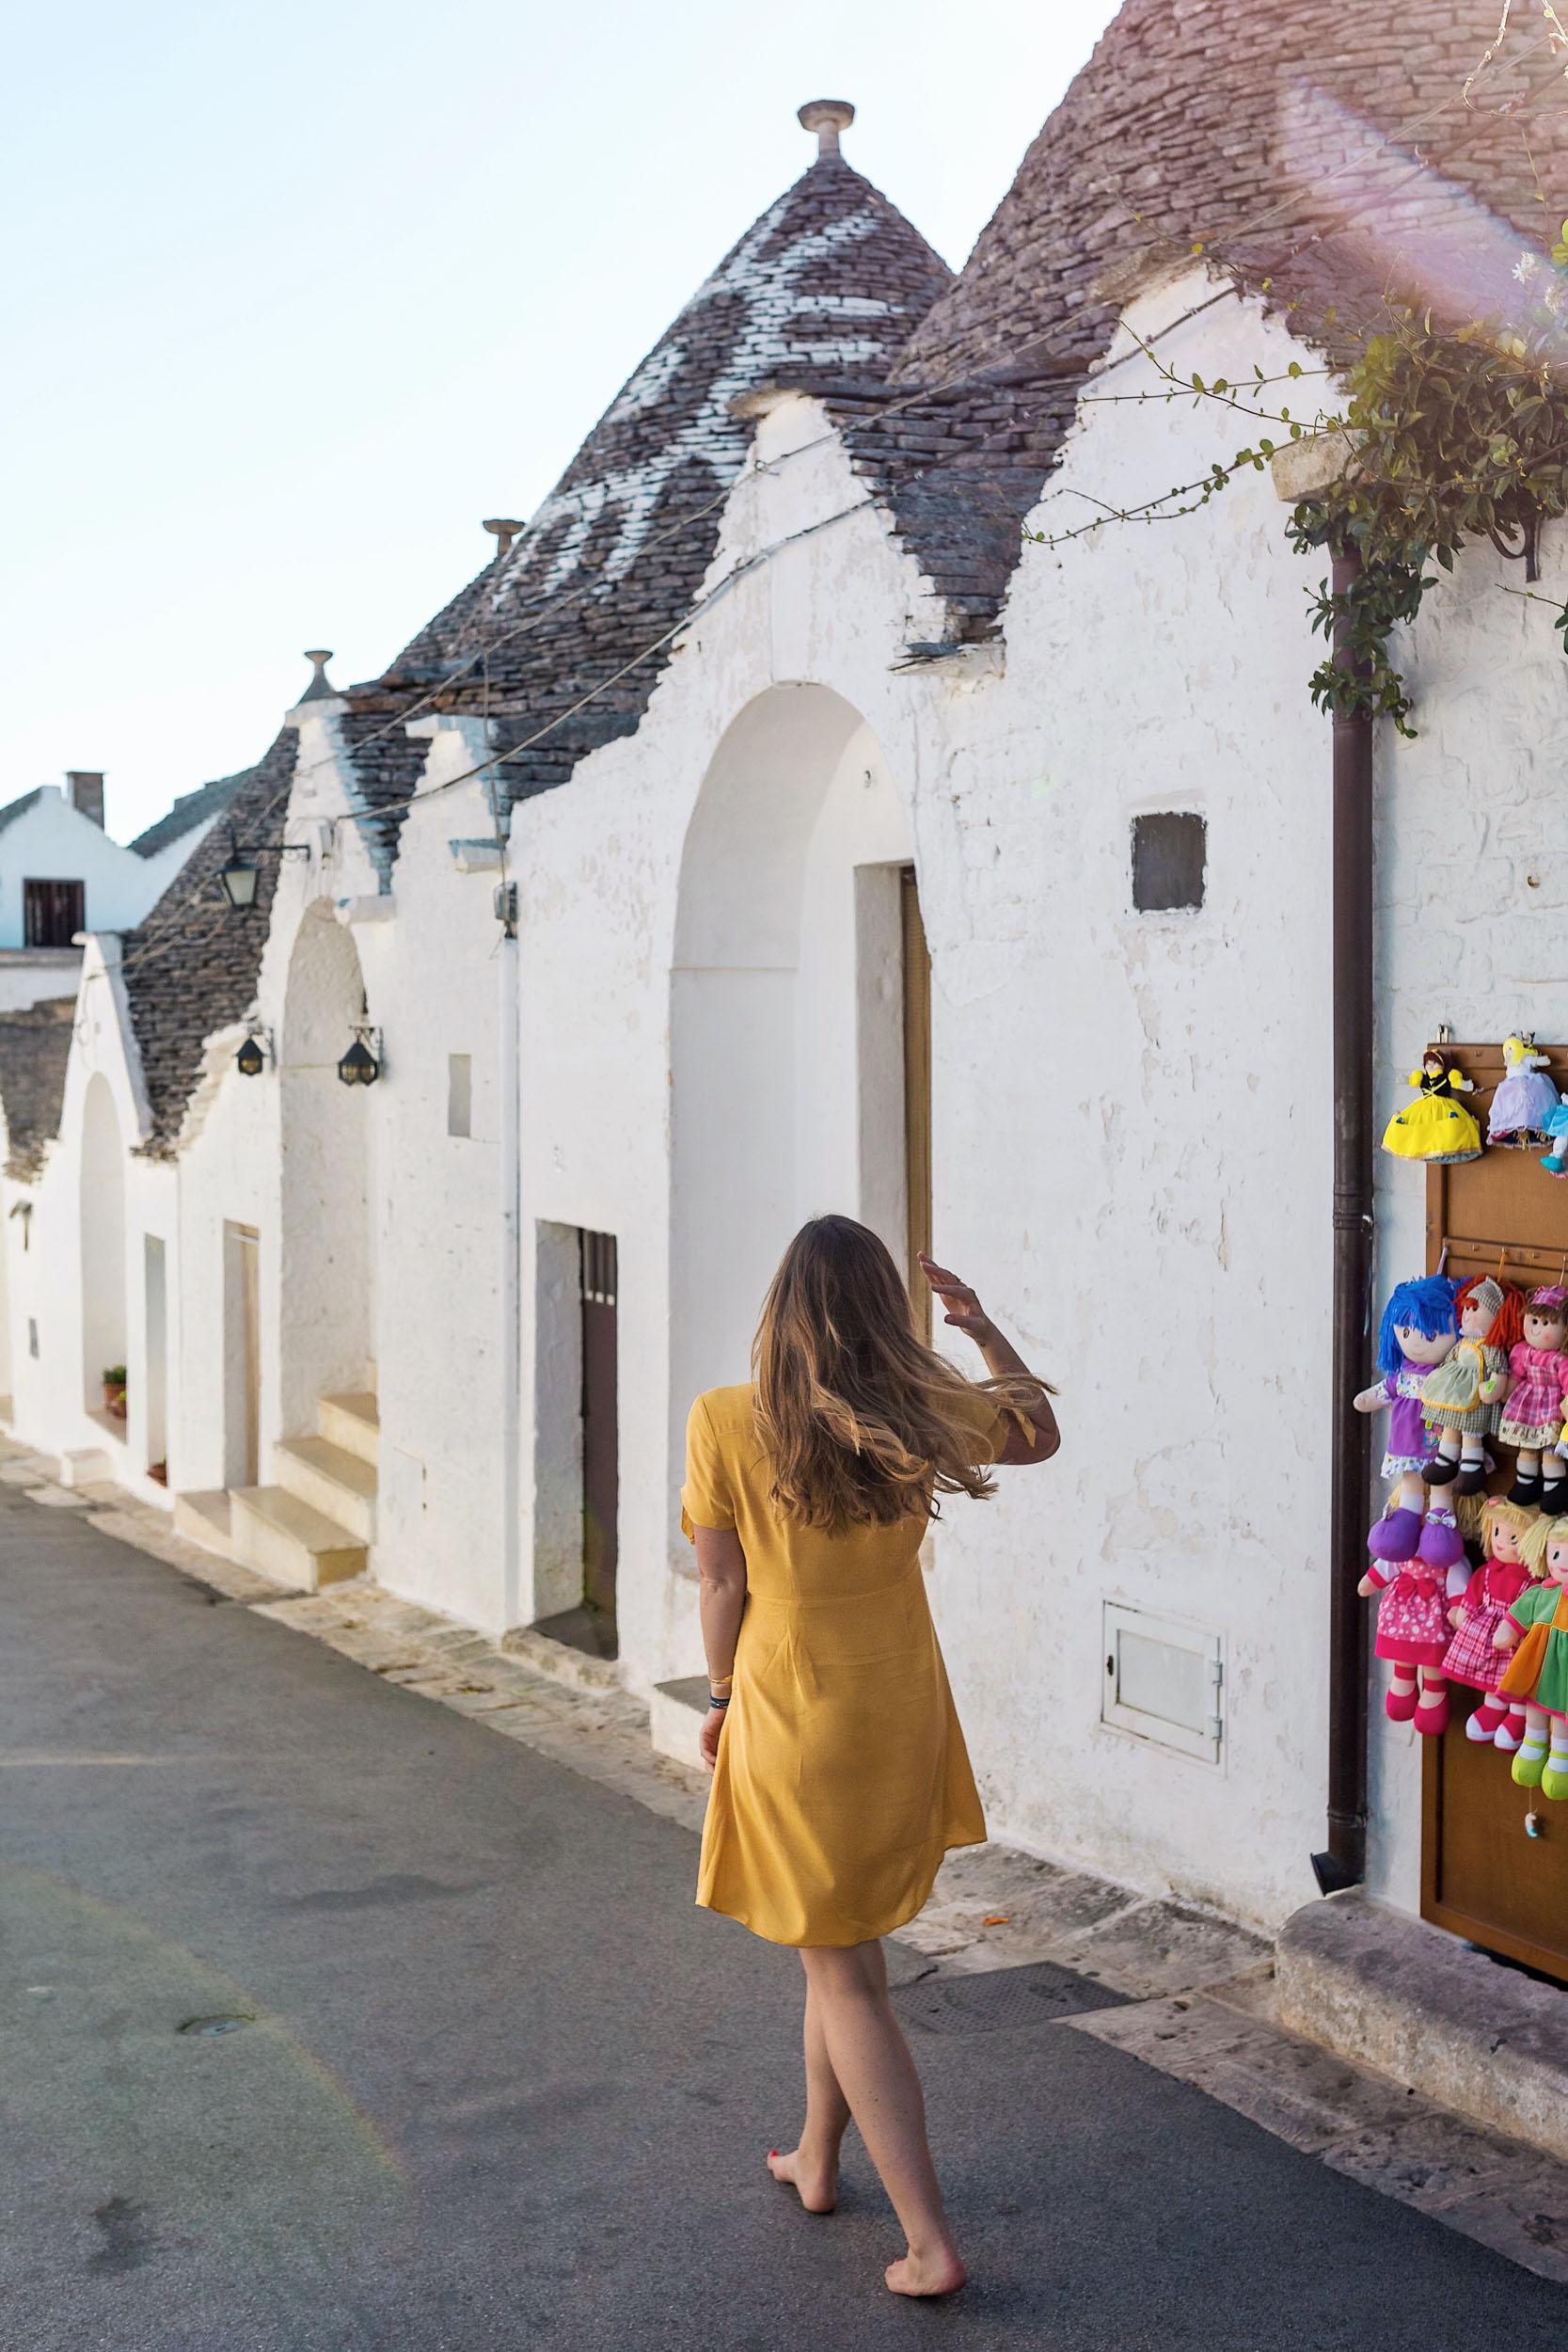 My favorite thing to do in Alberobello, Puglia, Italy: explore!